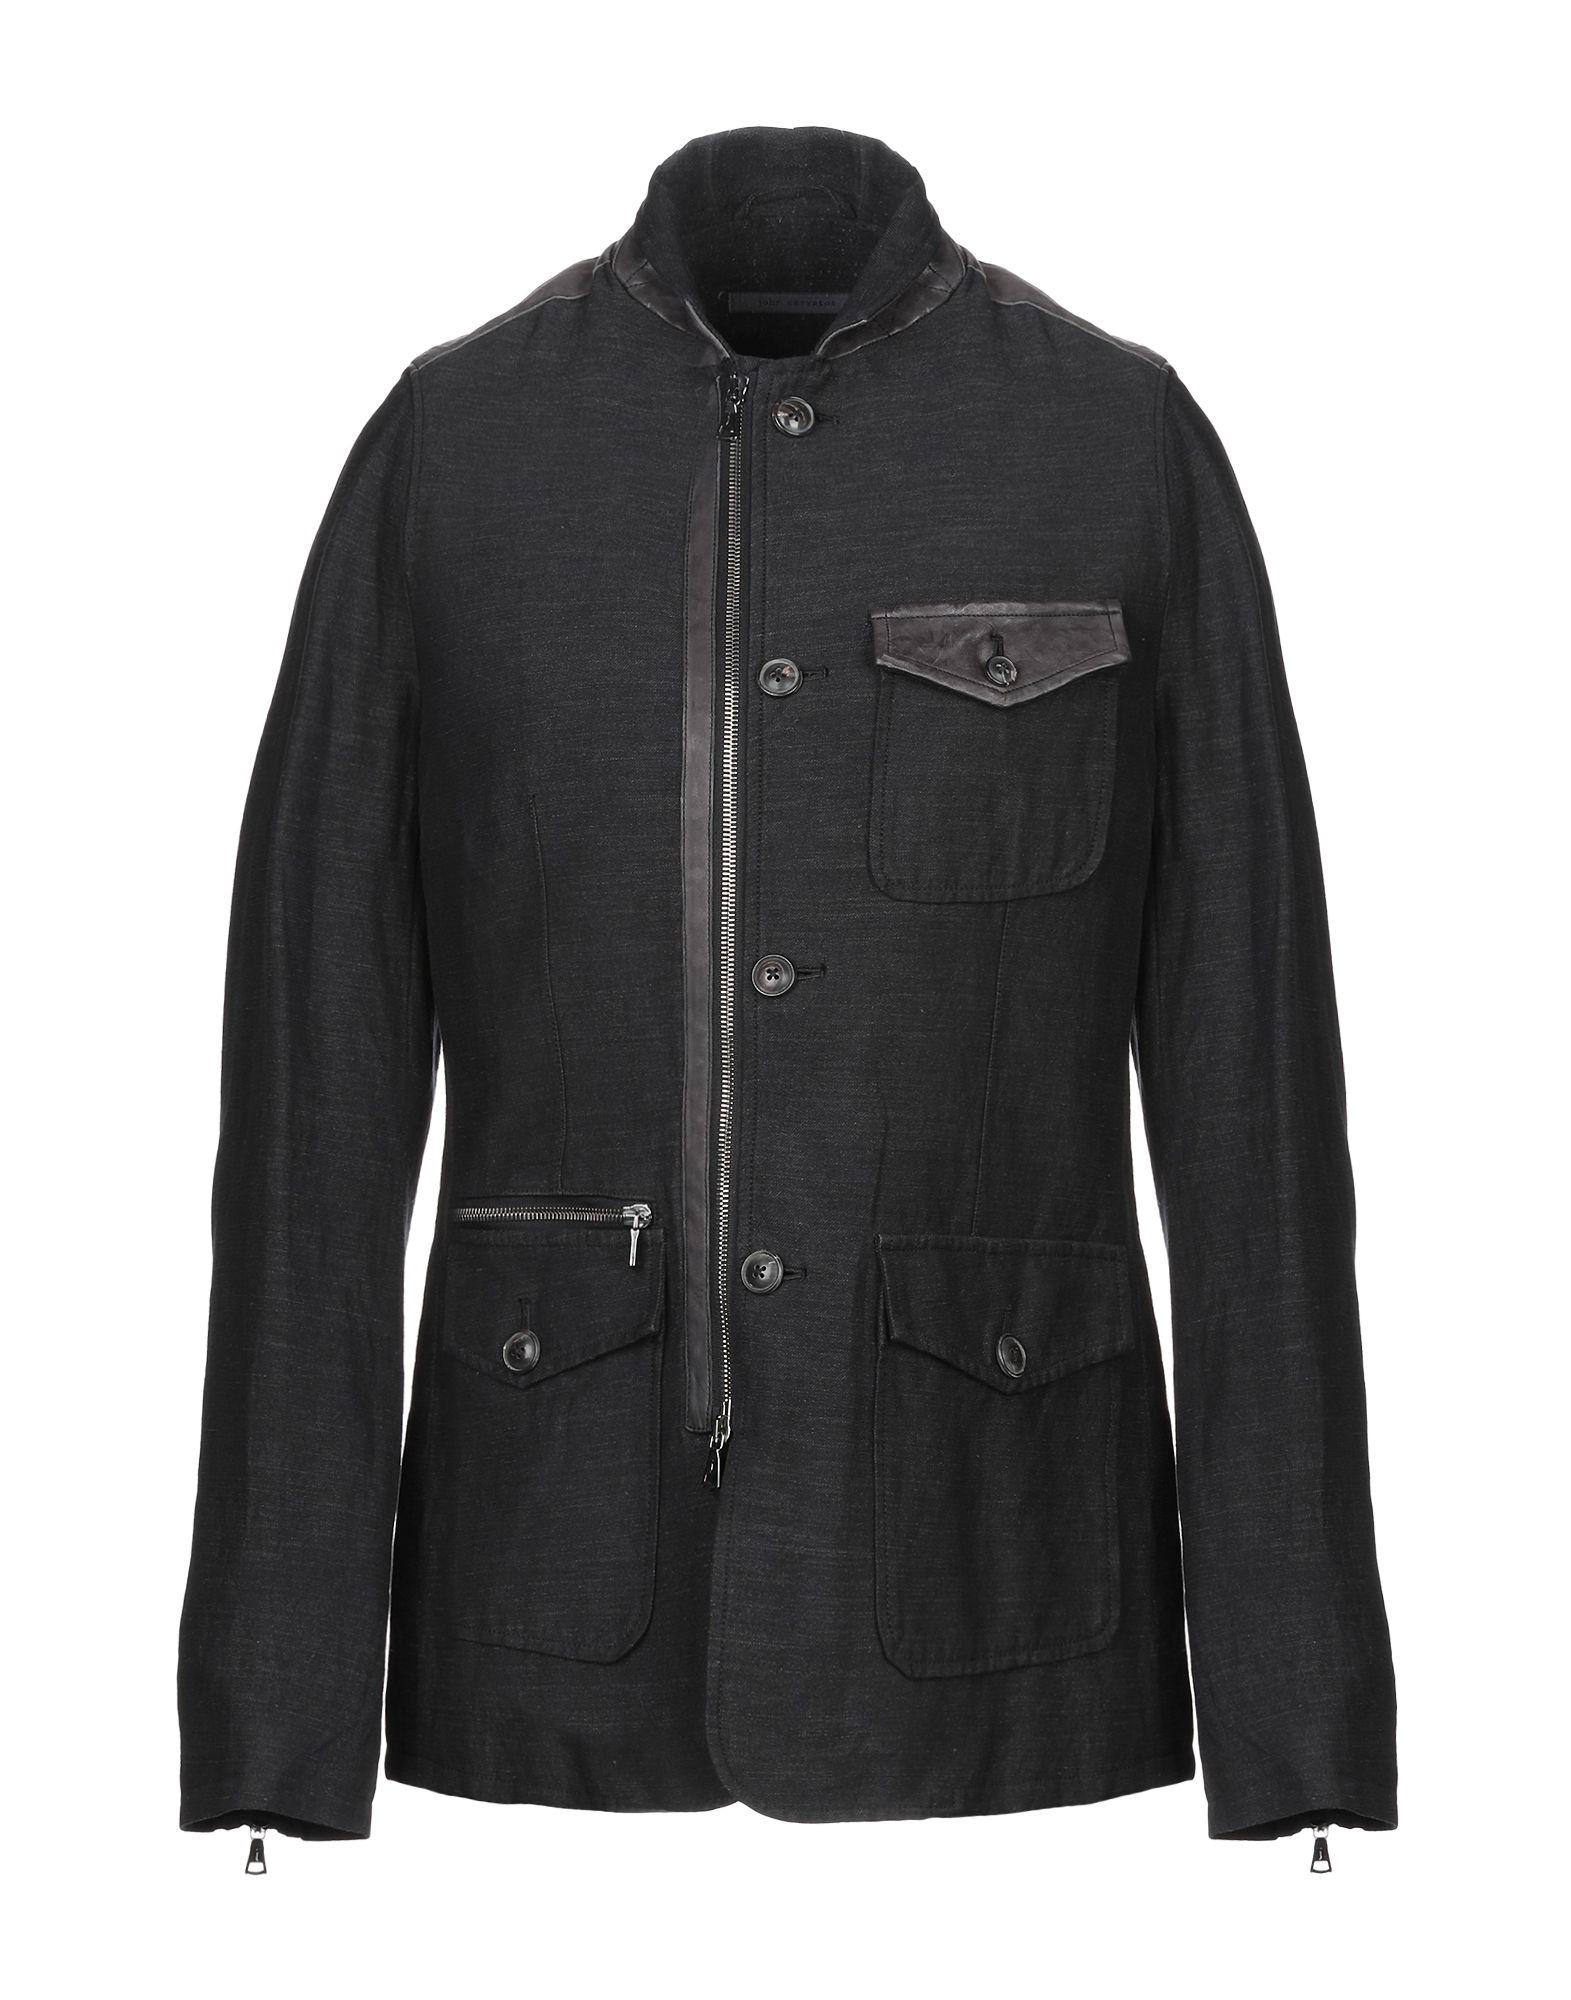 John Varvatos Jacket In Steel Grey